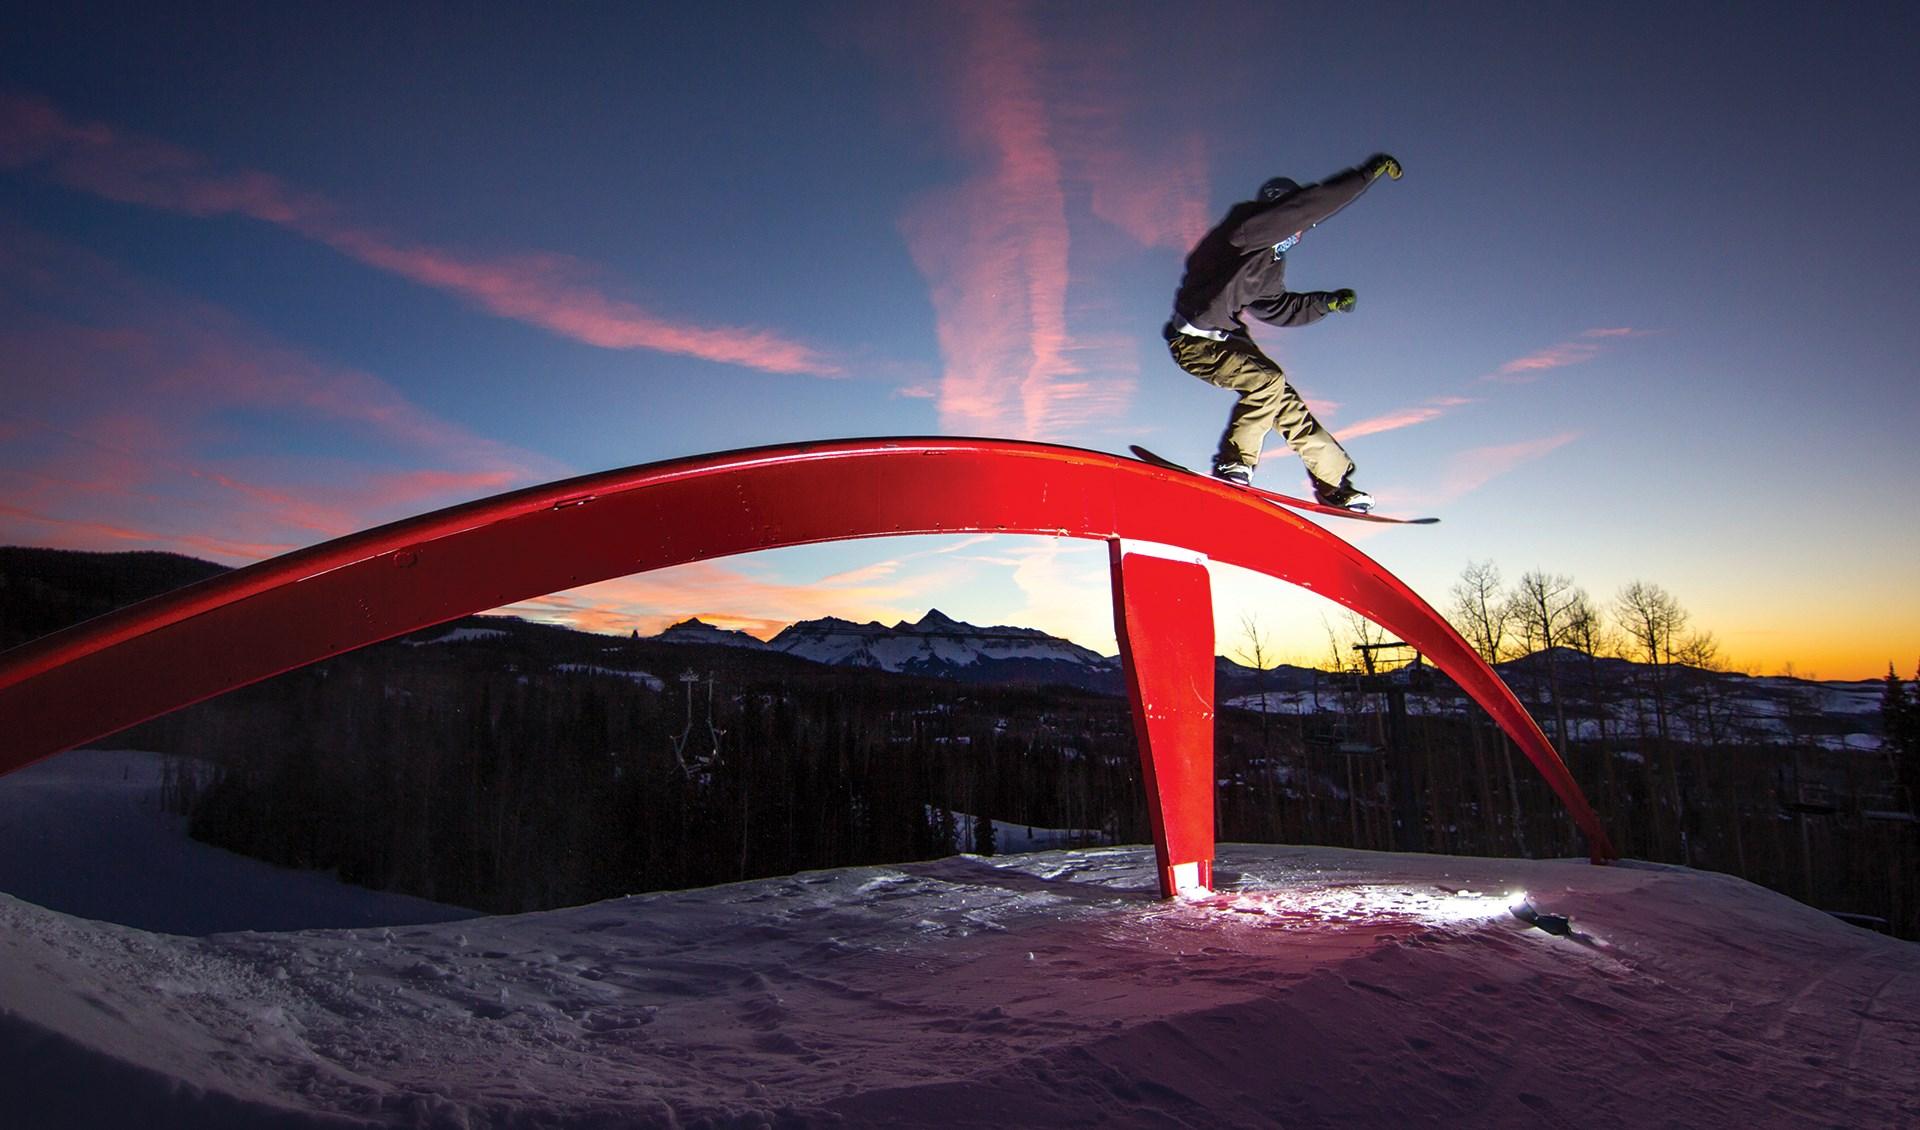 Snowboarder Riding the Rail at Telluride Ski Resort